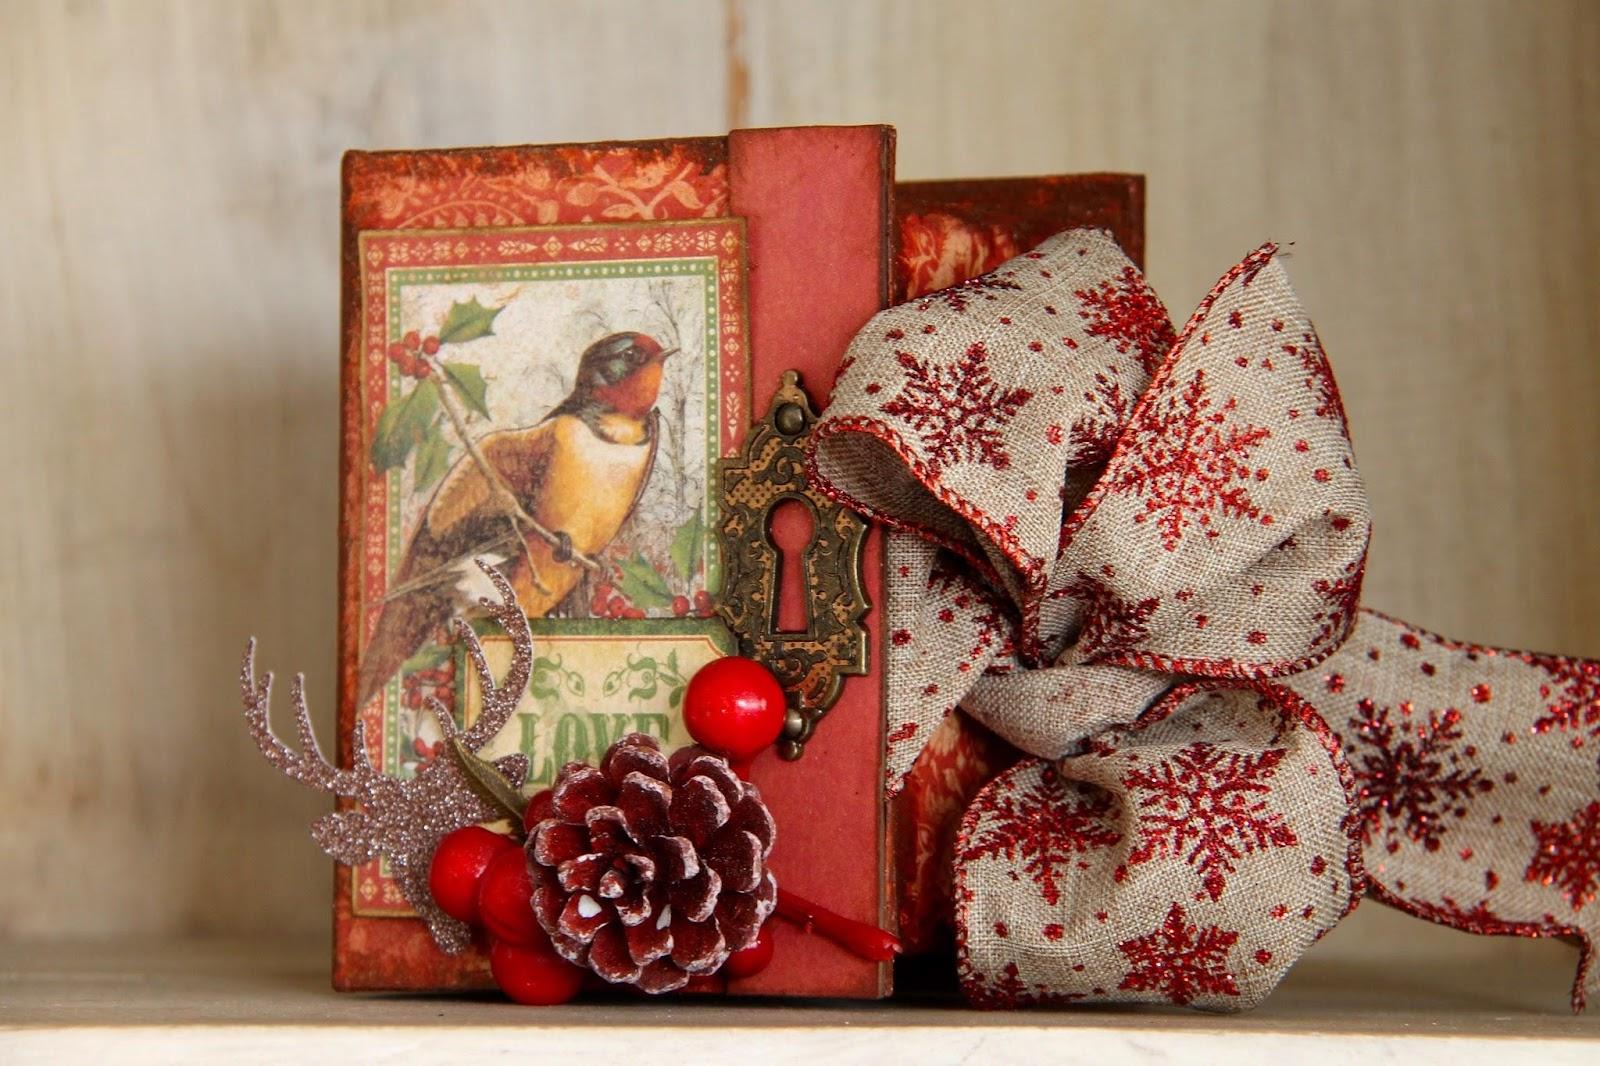 Winter Wonderland Book Box by Marina Blaukitchen Product by Graphic 45 photo 2.jpg